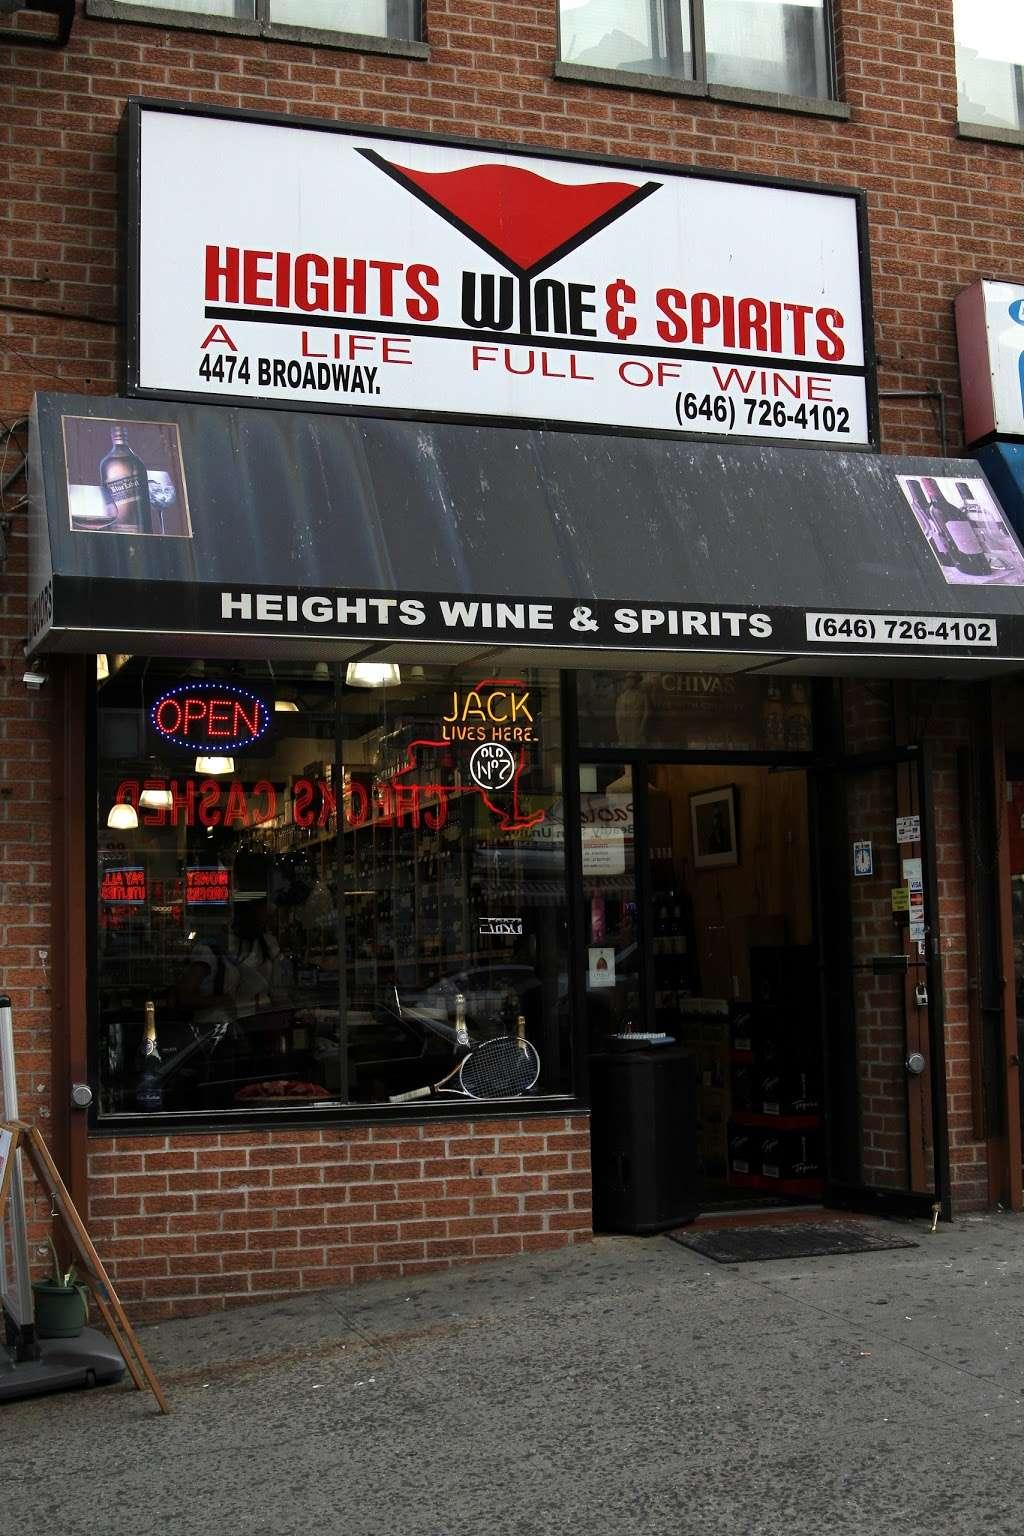 Heights Wine & Spirits Corporation - store  | Photo 7 of 10 | Address: 4474 Broadway, New York, NY 10040, USA | Phone: (646) 726-4102